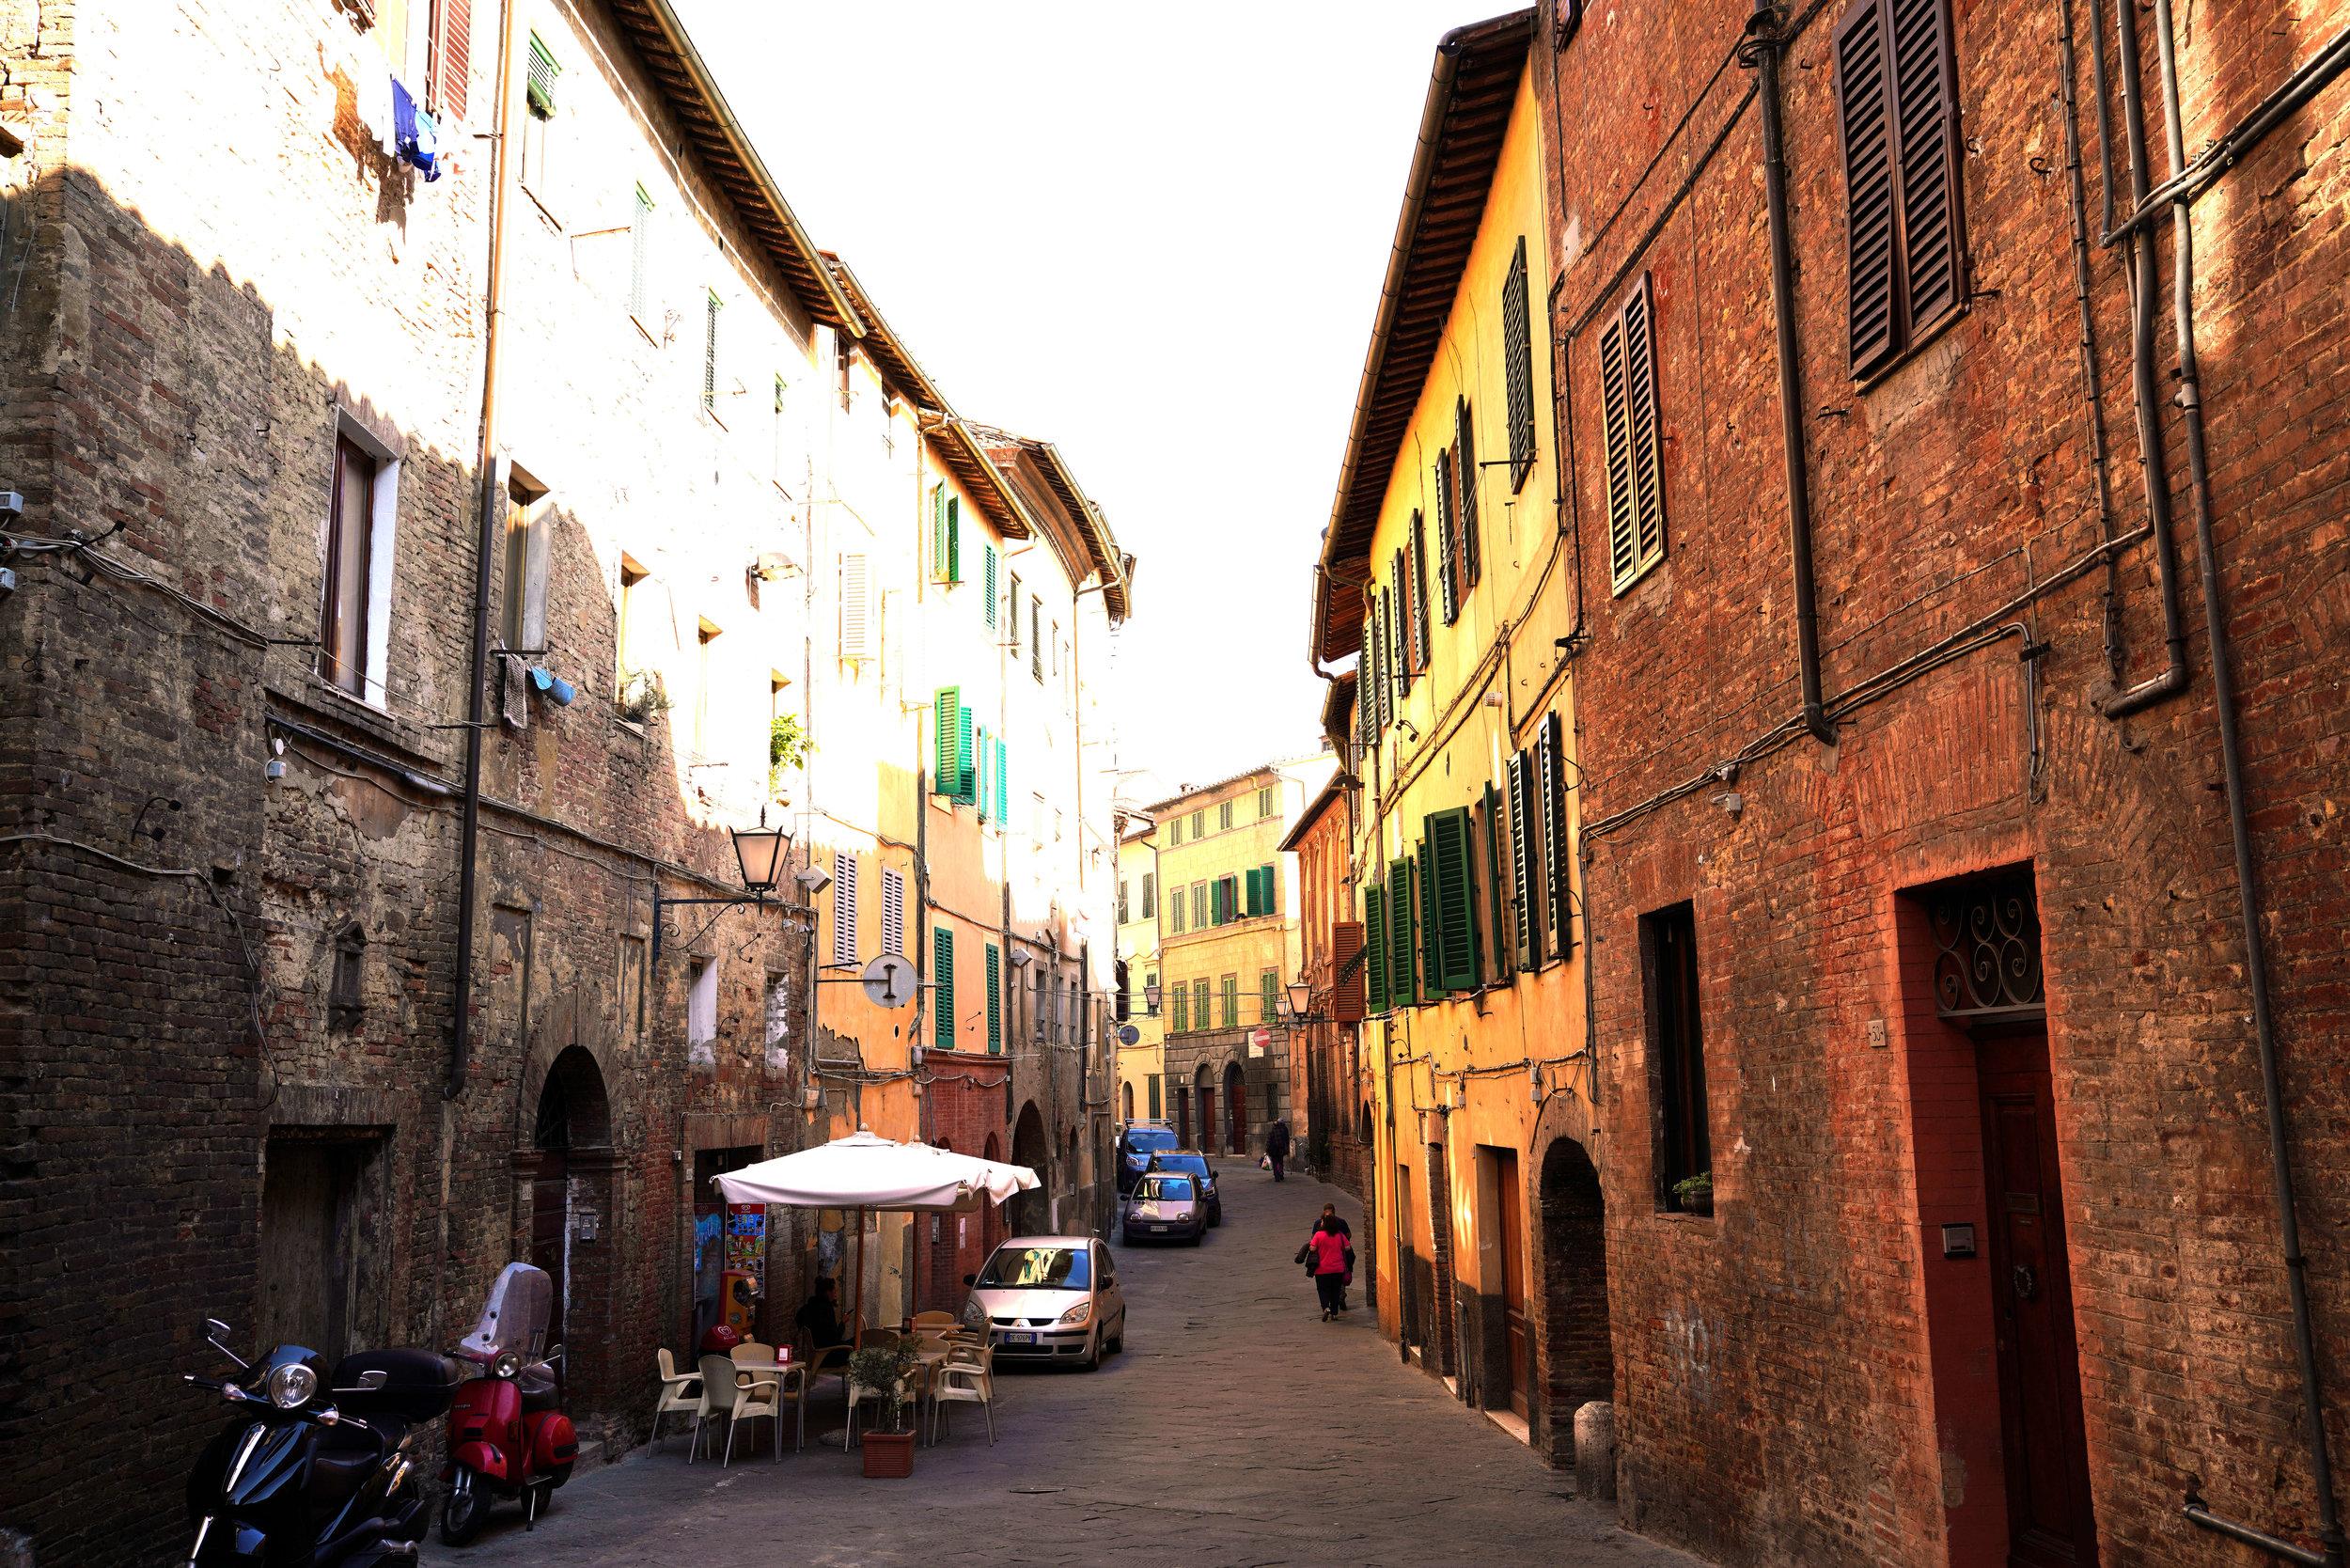 The narrow, steep streets of Siena.